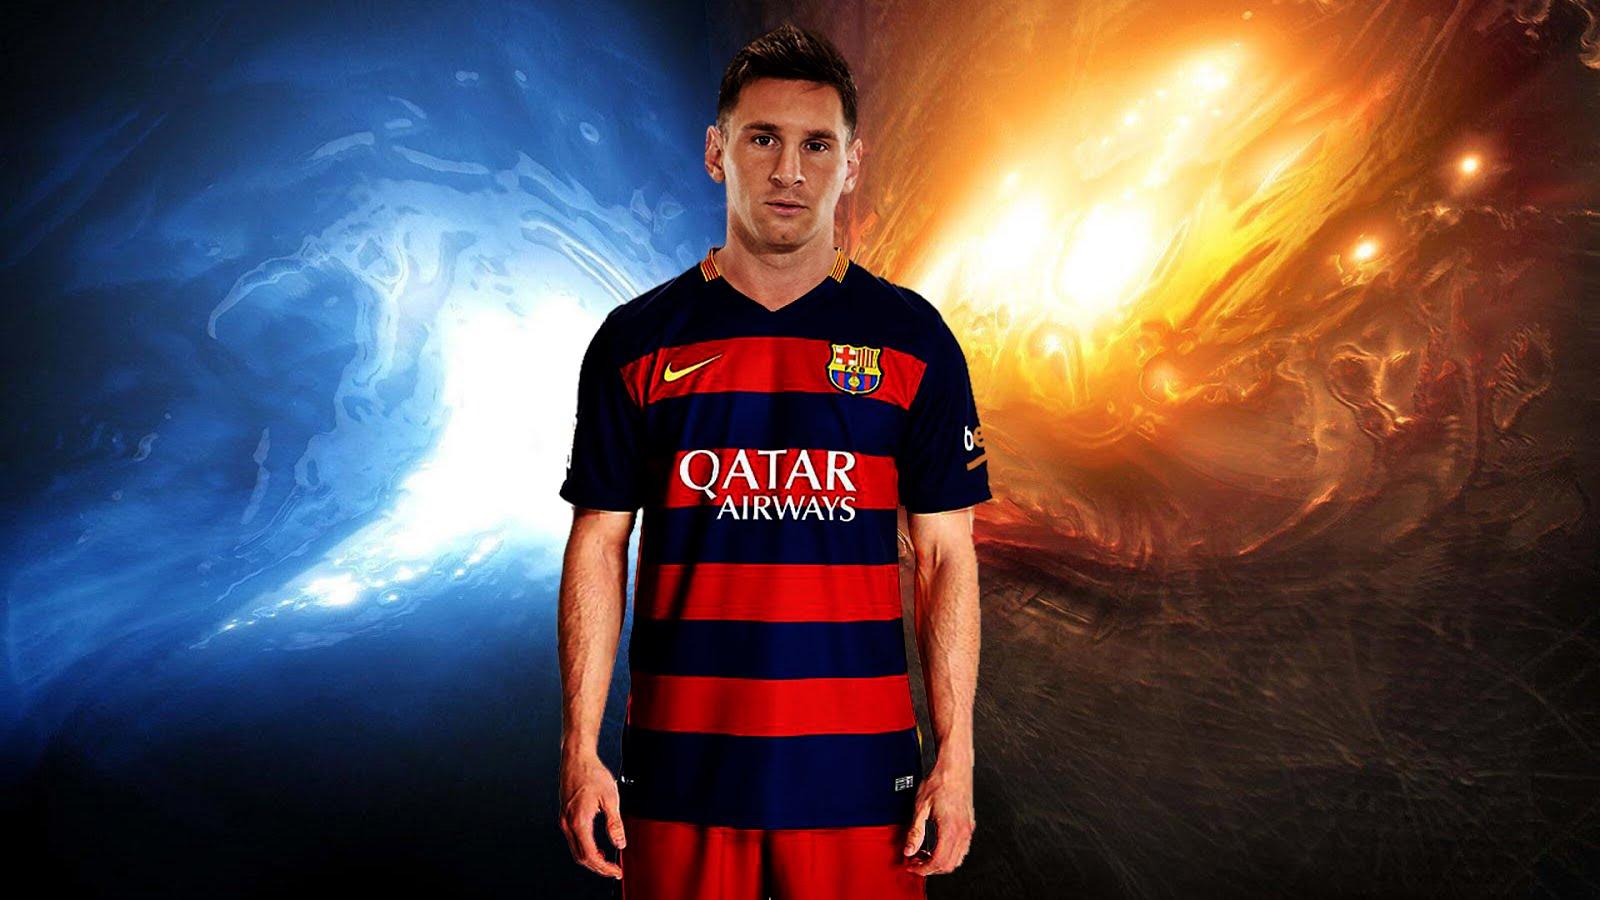 Argentina Soccer Lionel Messi 2016 Wallpaper HD 1600x900